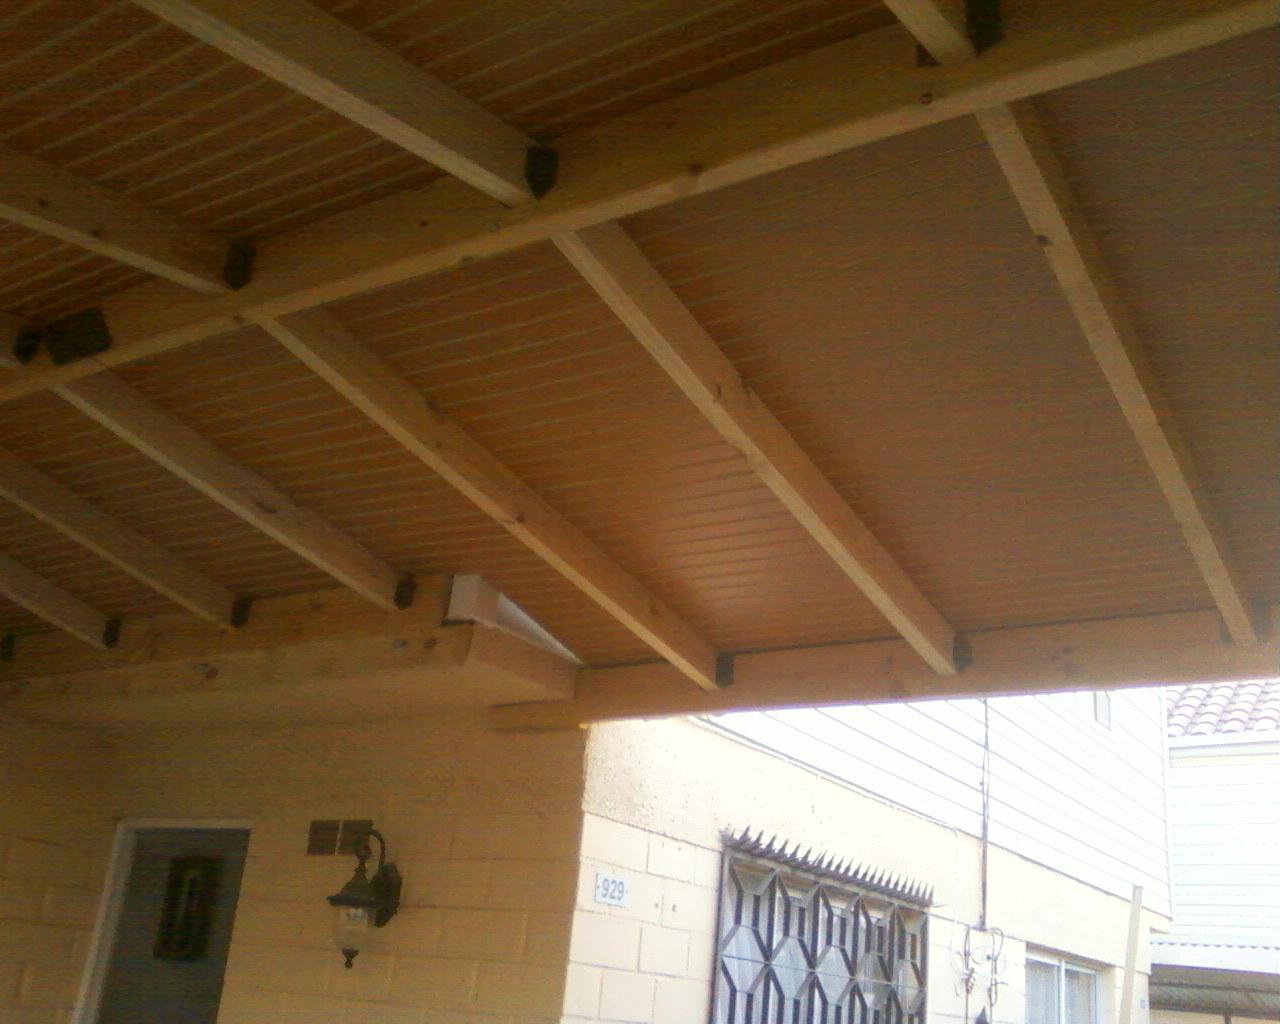 Silva e hijos cobertizo madera for Cobertizo de madera tratada